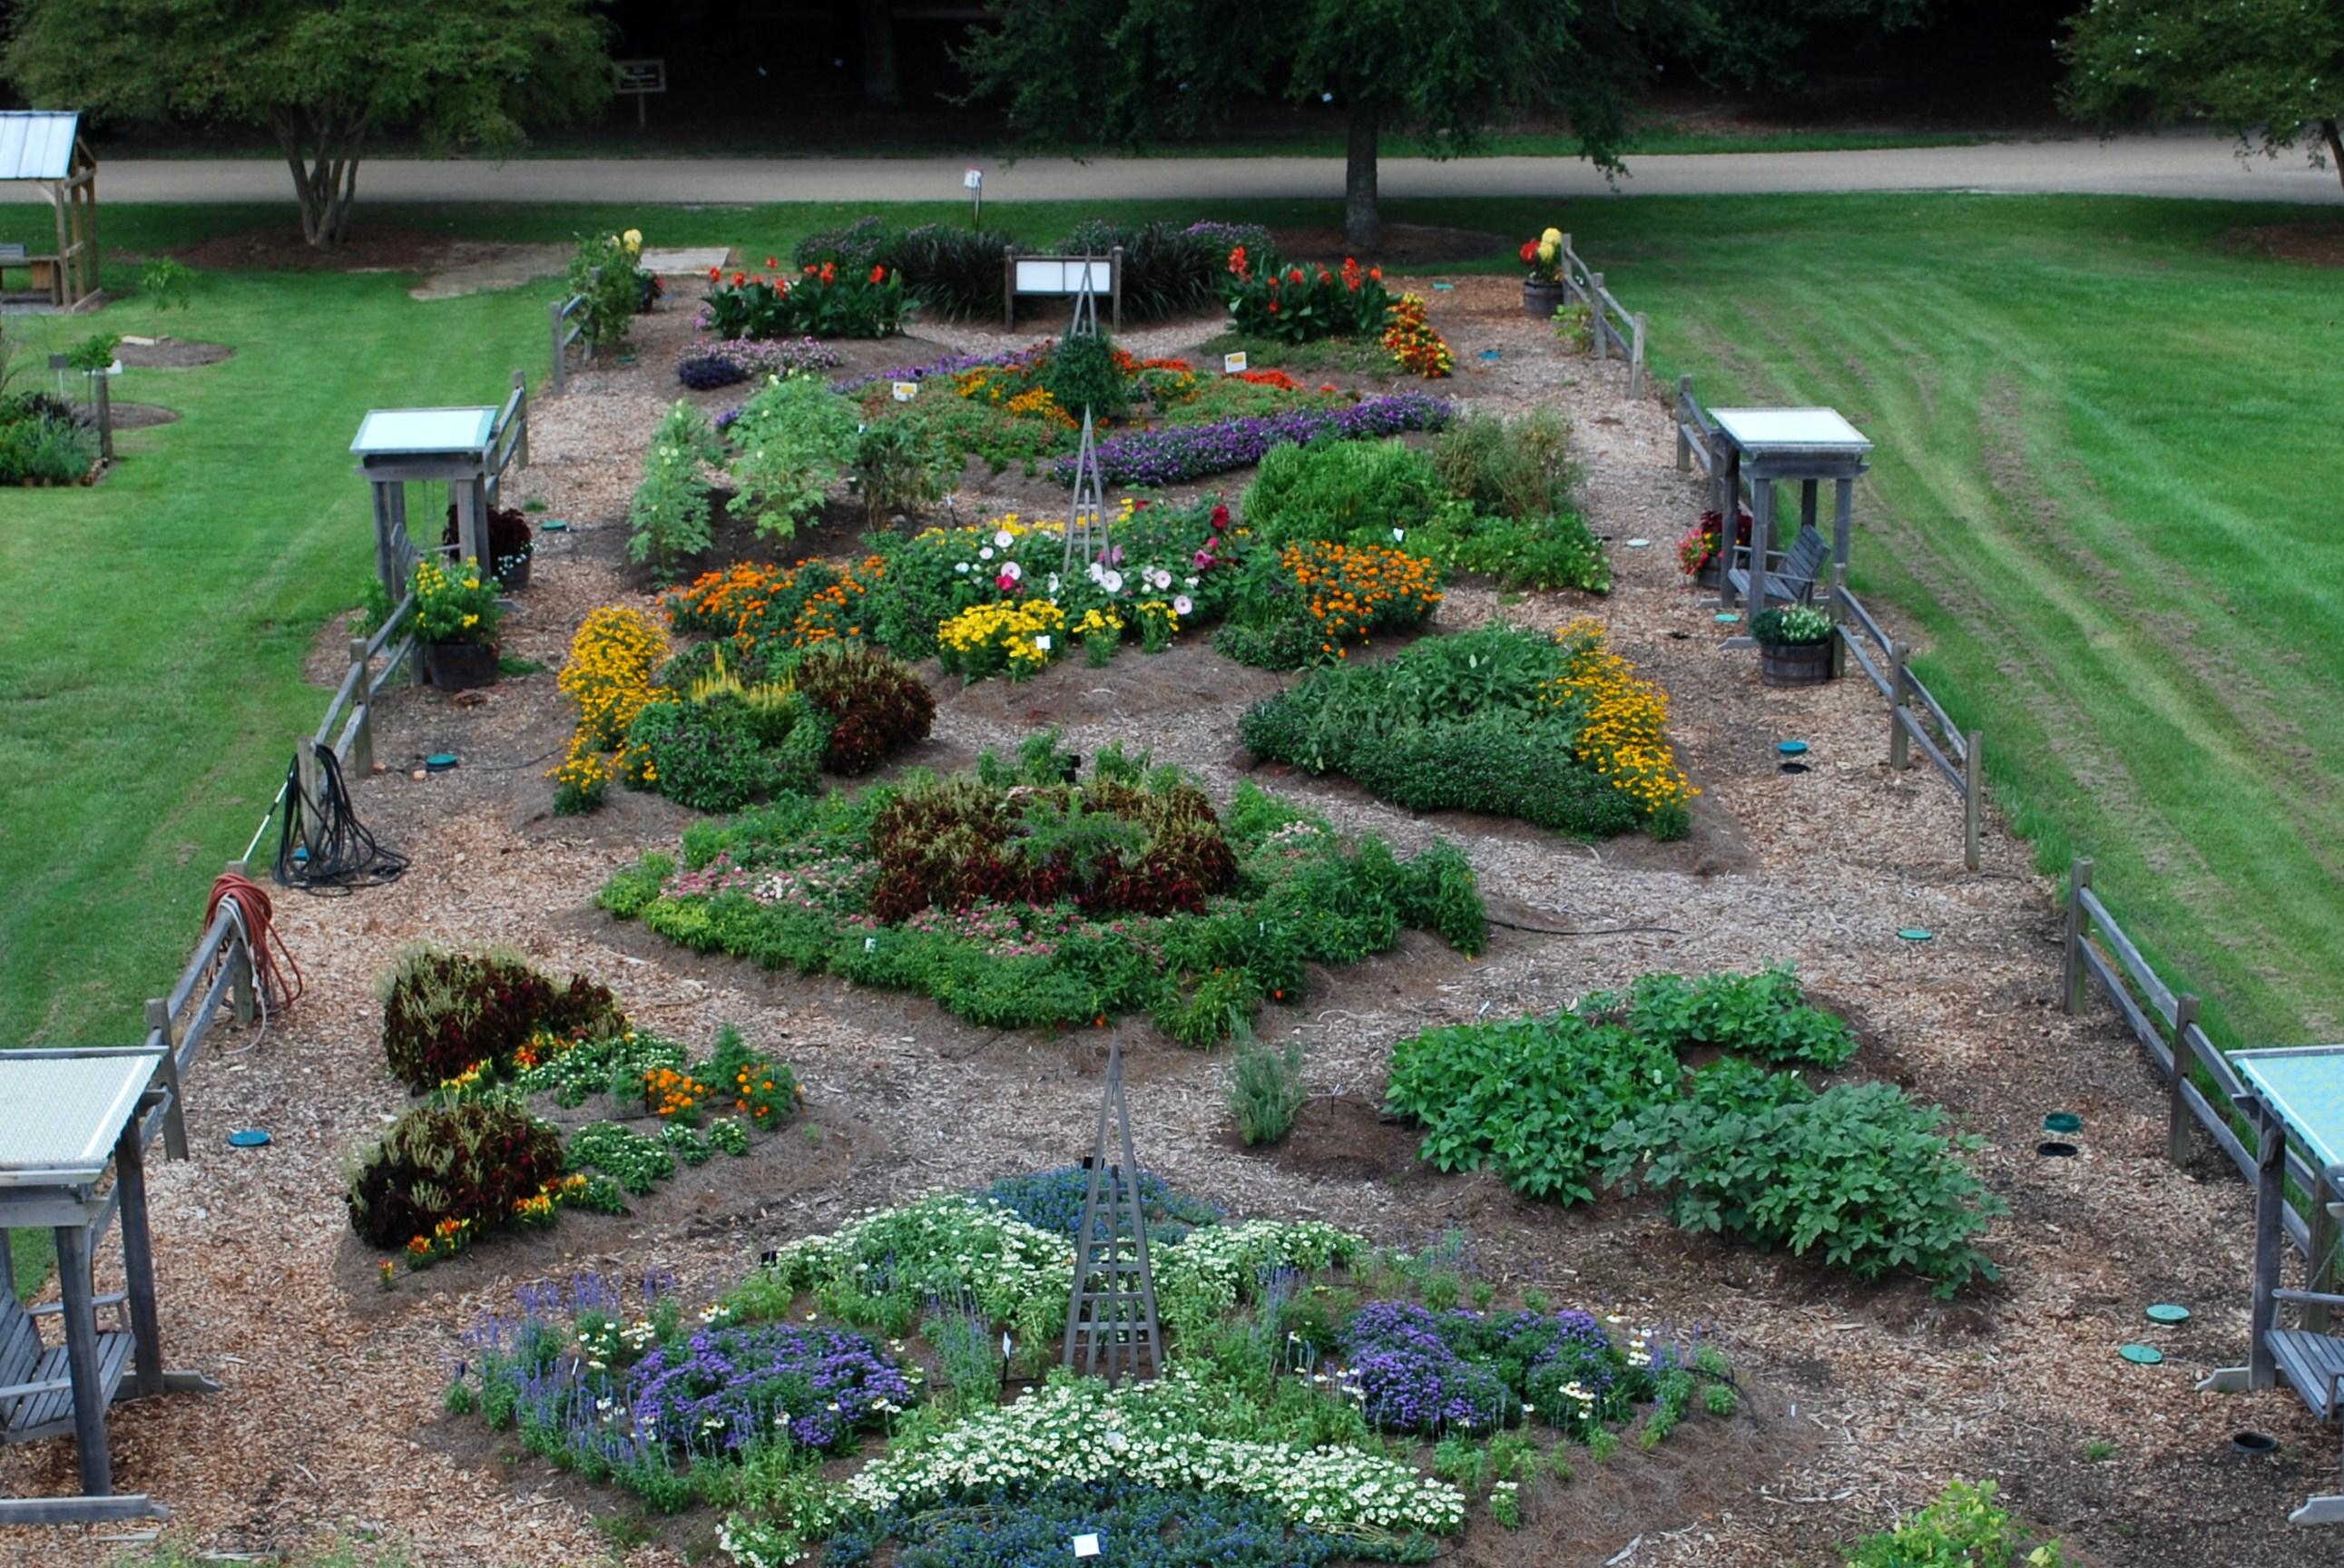 Botanic gardens wins national design award lsu agcenter for 50ft garden design